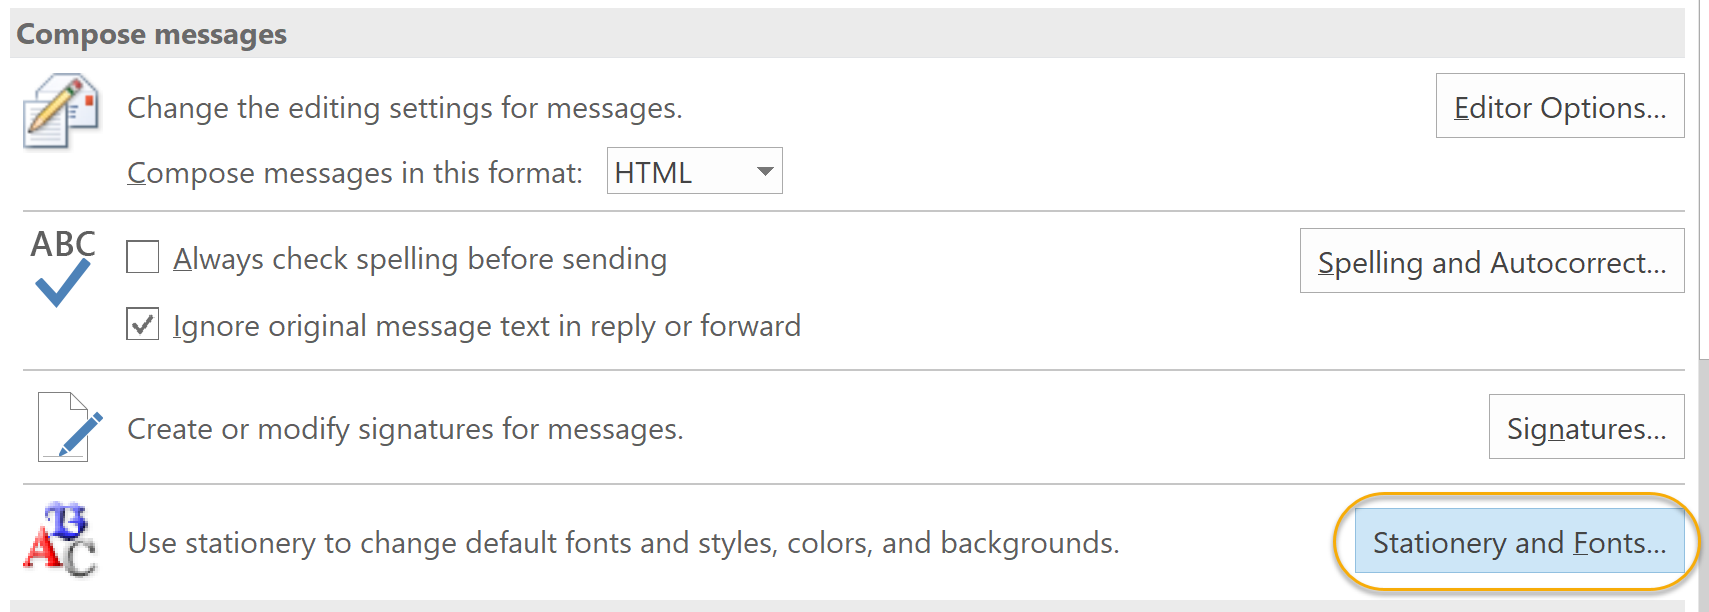 Compose Message Command